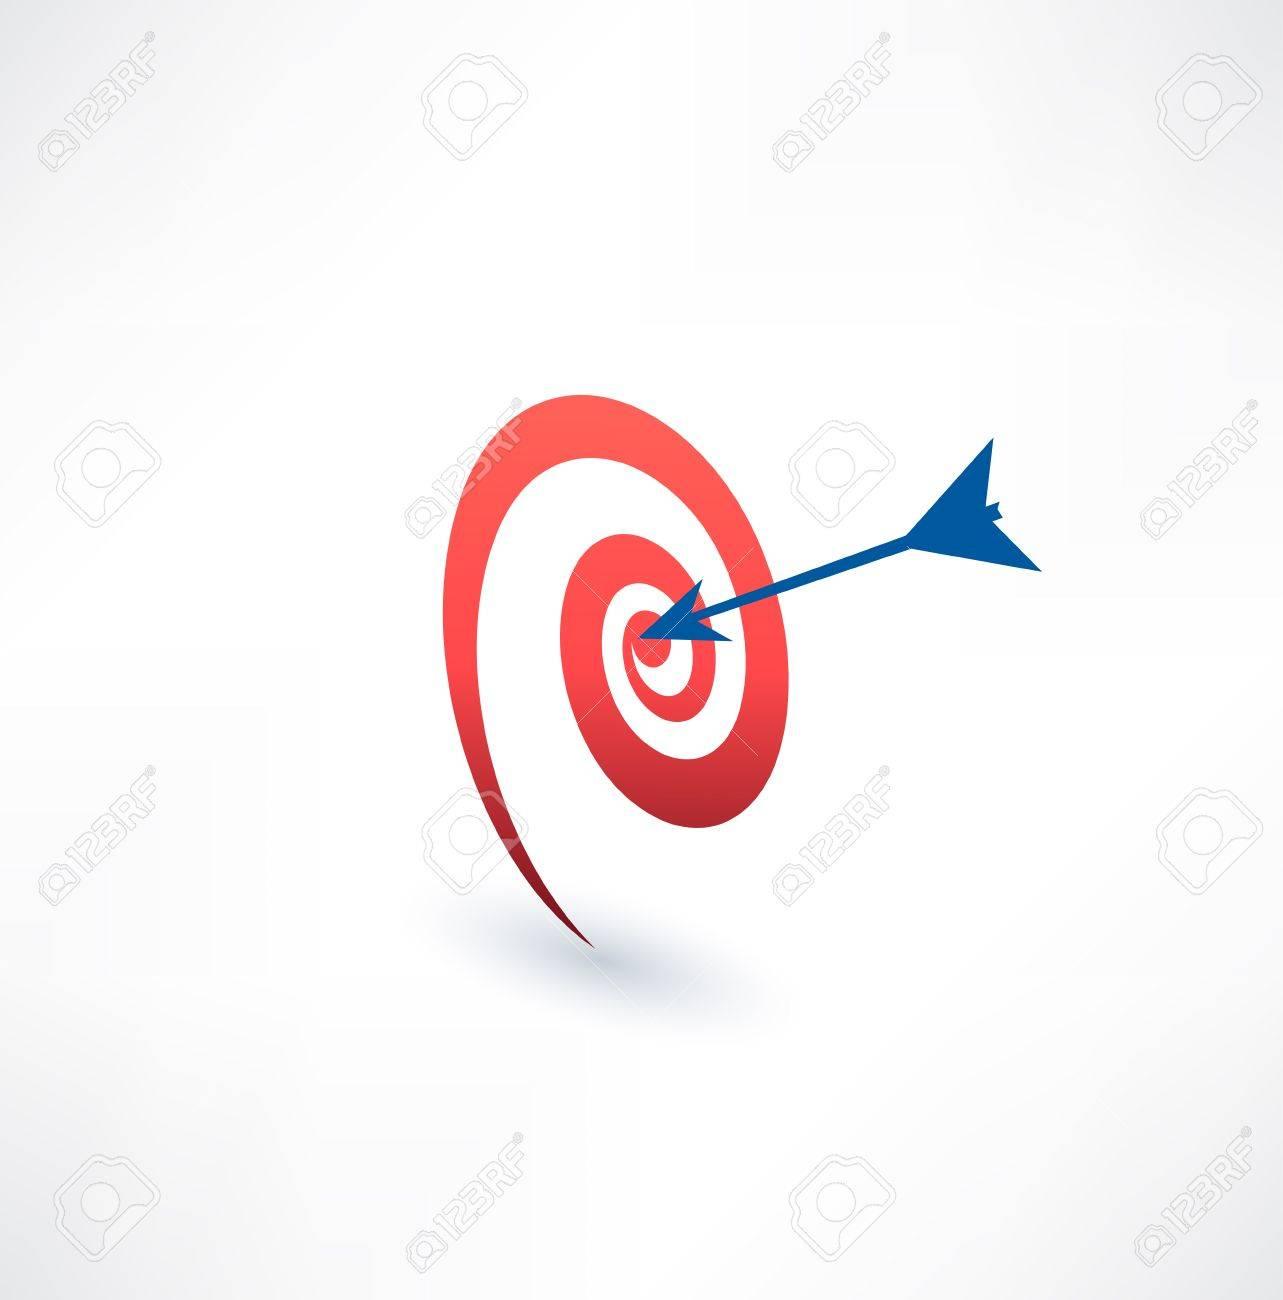 Target and arrow icon. The concept of purpose. Logo design. Standard-Bild - 33673038